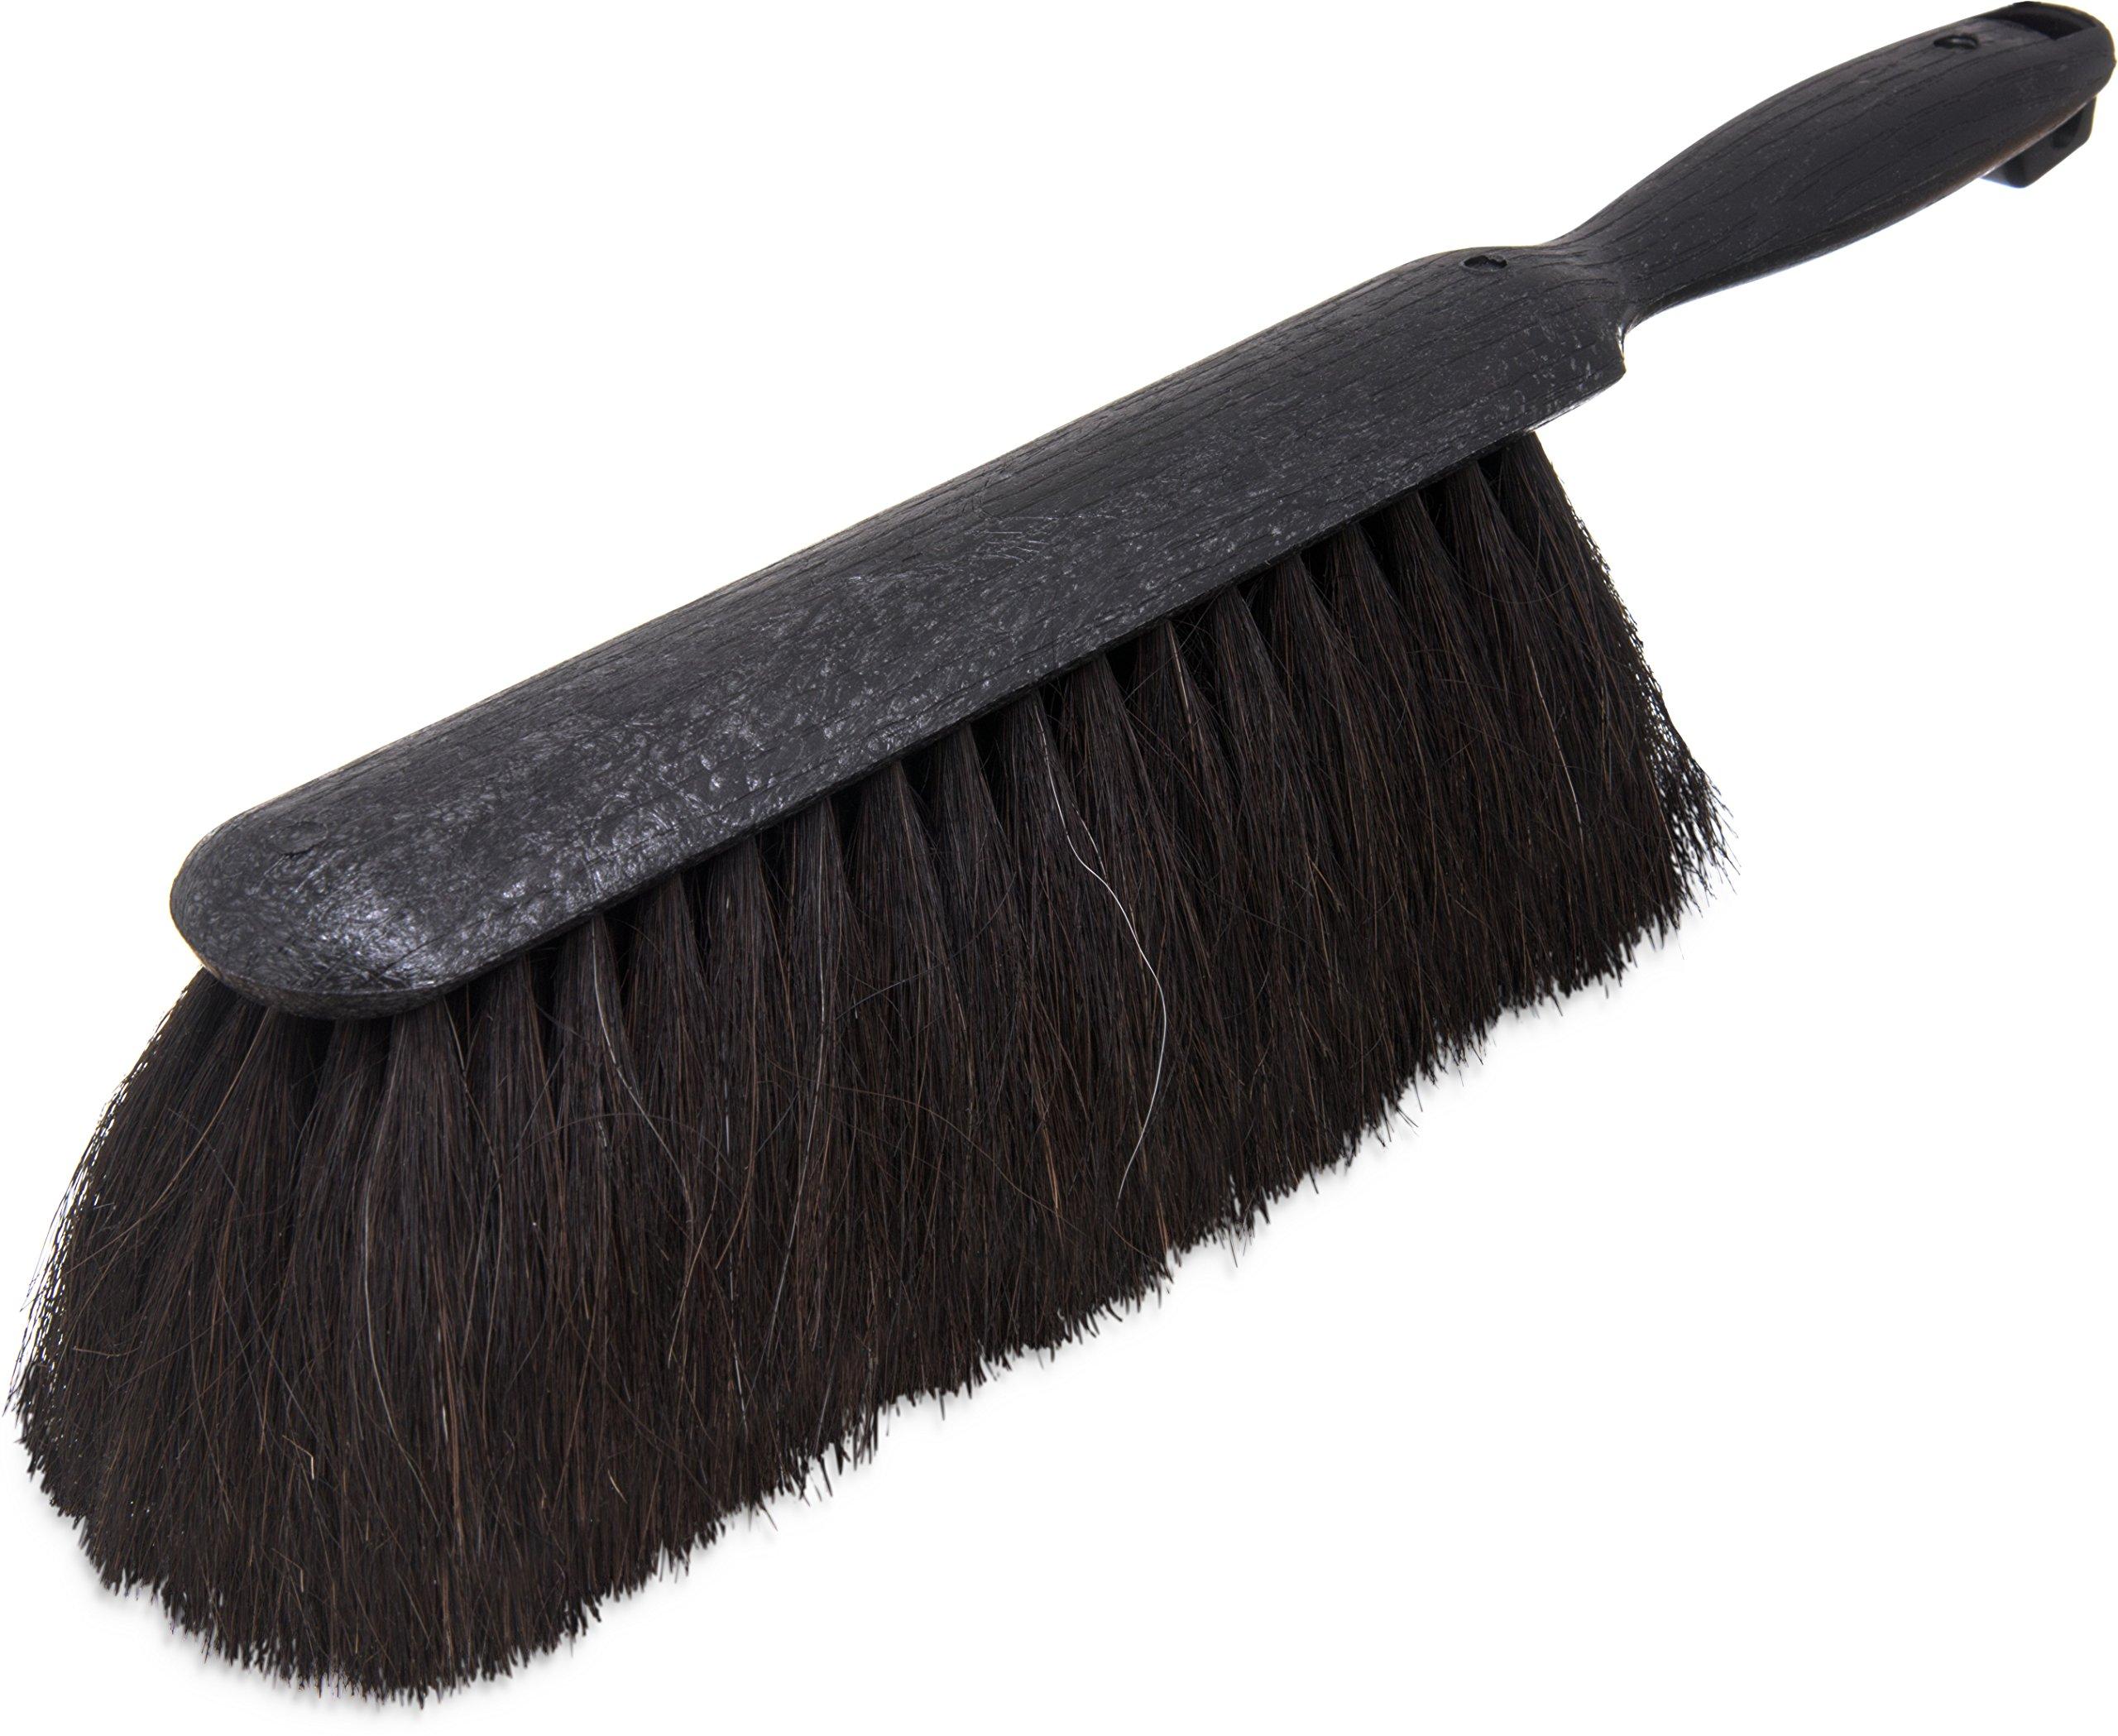 Carlisle 3638003 Flo-Pac Plastic Handle Counter Brush, Horsehair Bristles, 9'' Length, Black